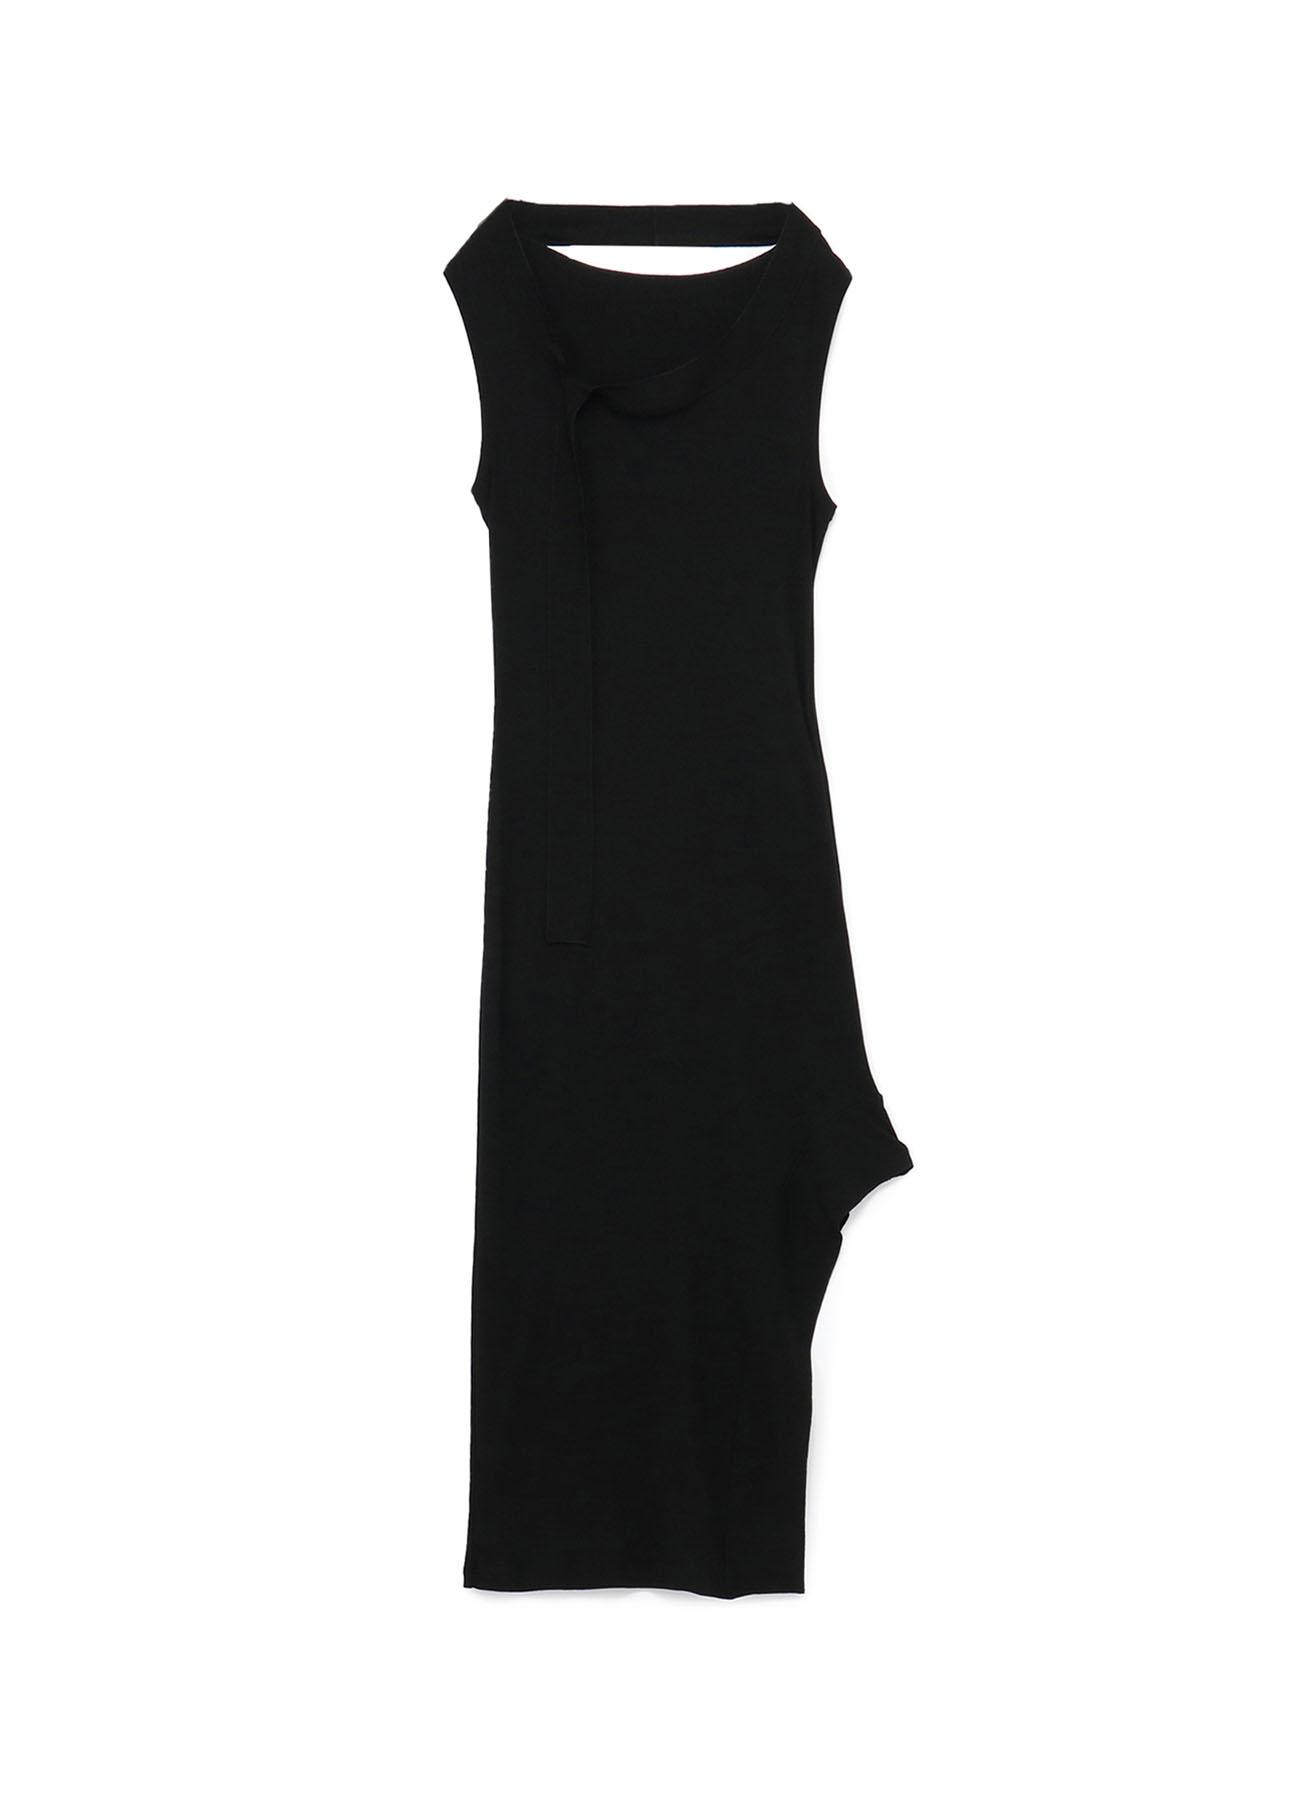 C/Ry Mix Up Rib Sleeveless Dress